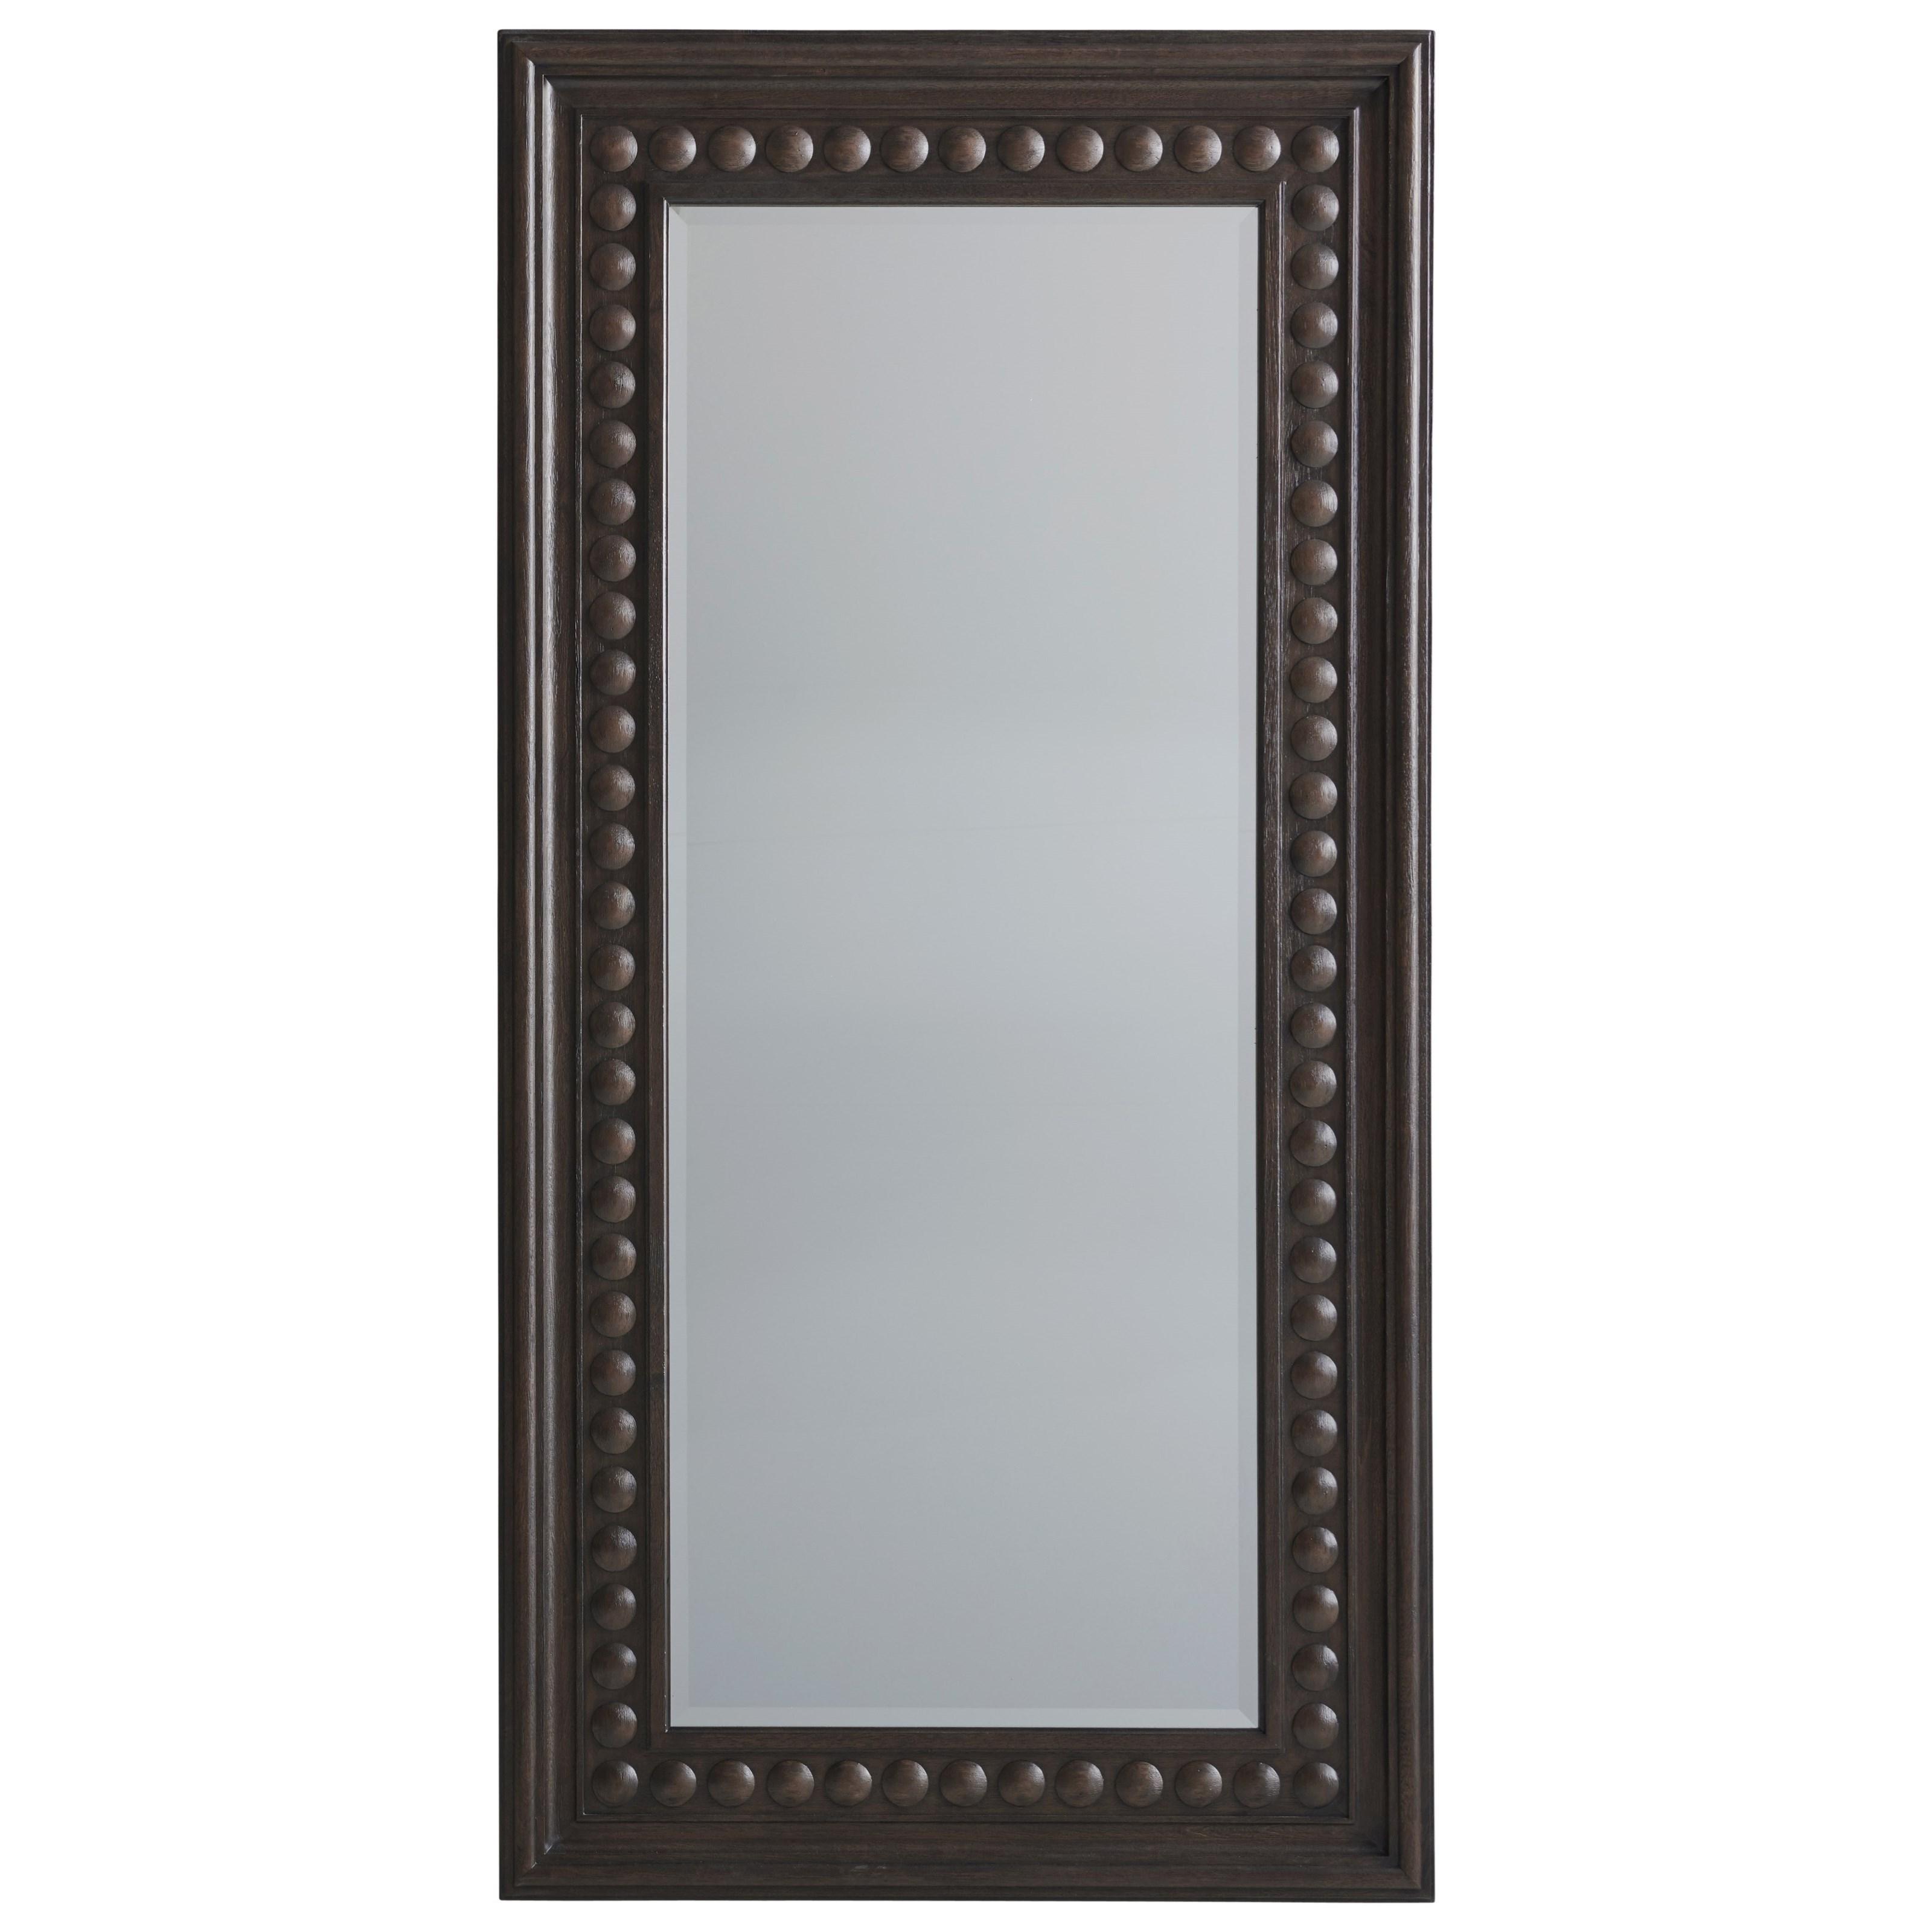 Malibu Carbon Floor Mirror by Barclay Butera at Baer's Furniture